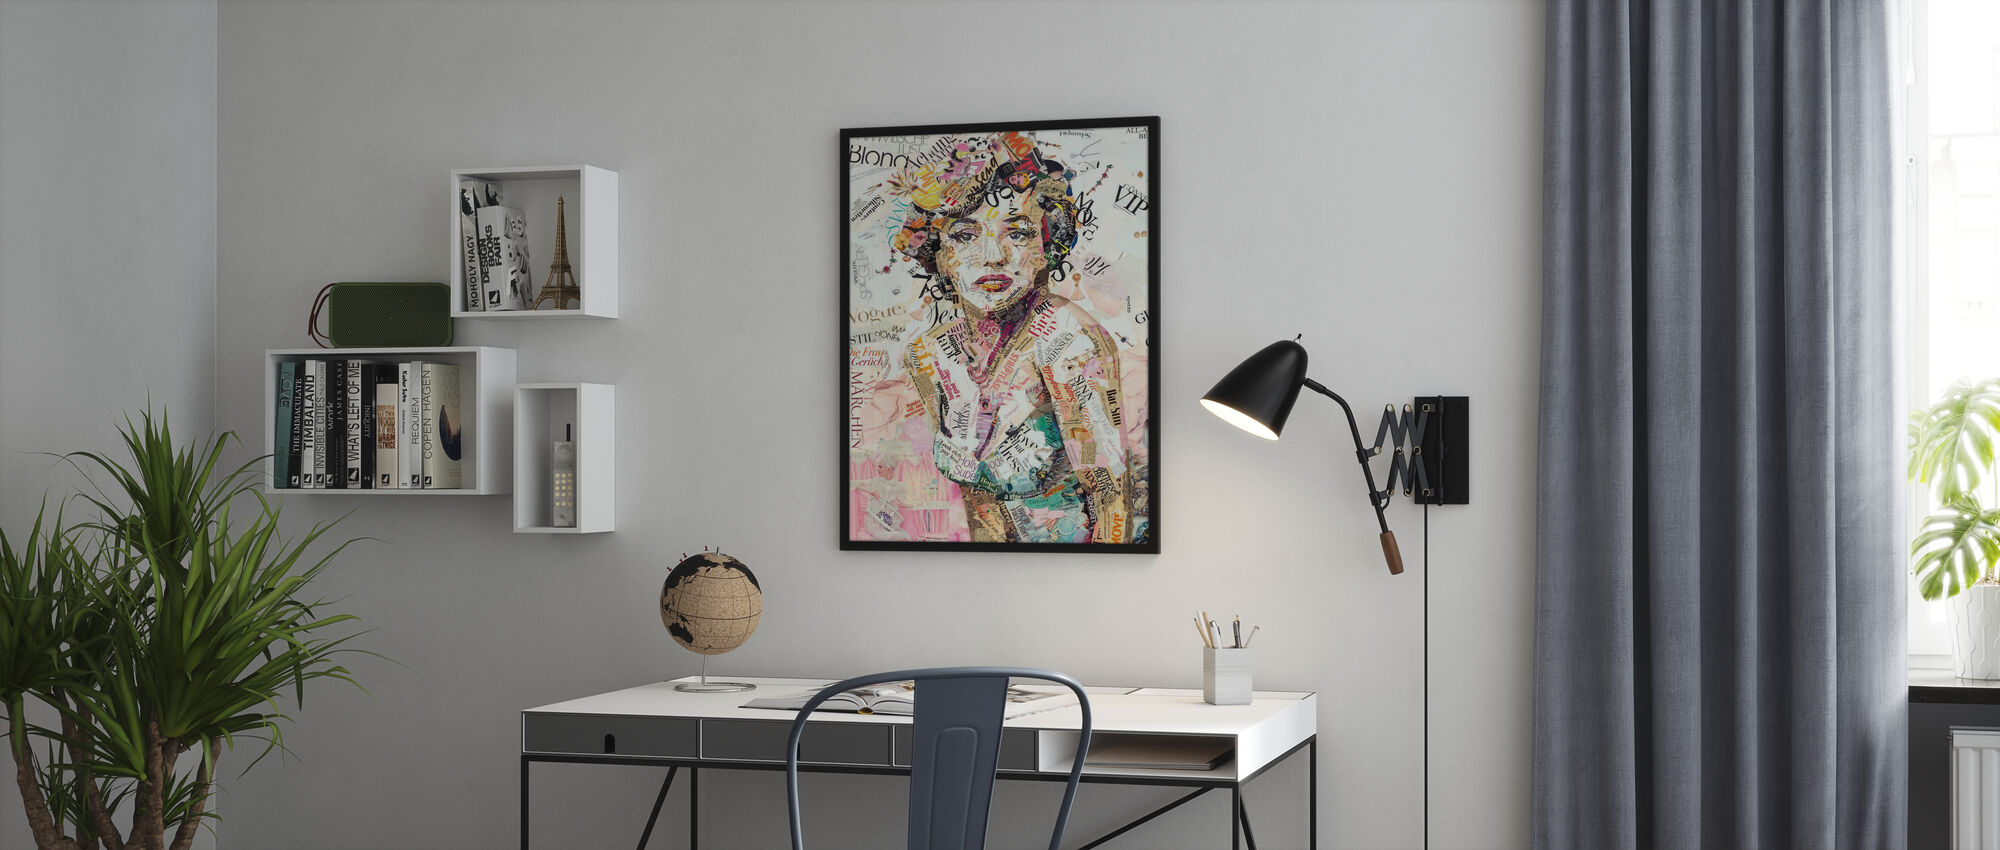 Glam en Glorie - Ingelijste print - Kantoor